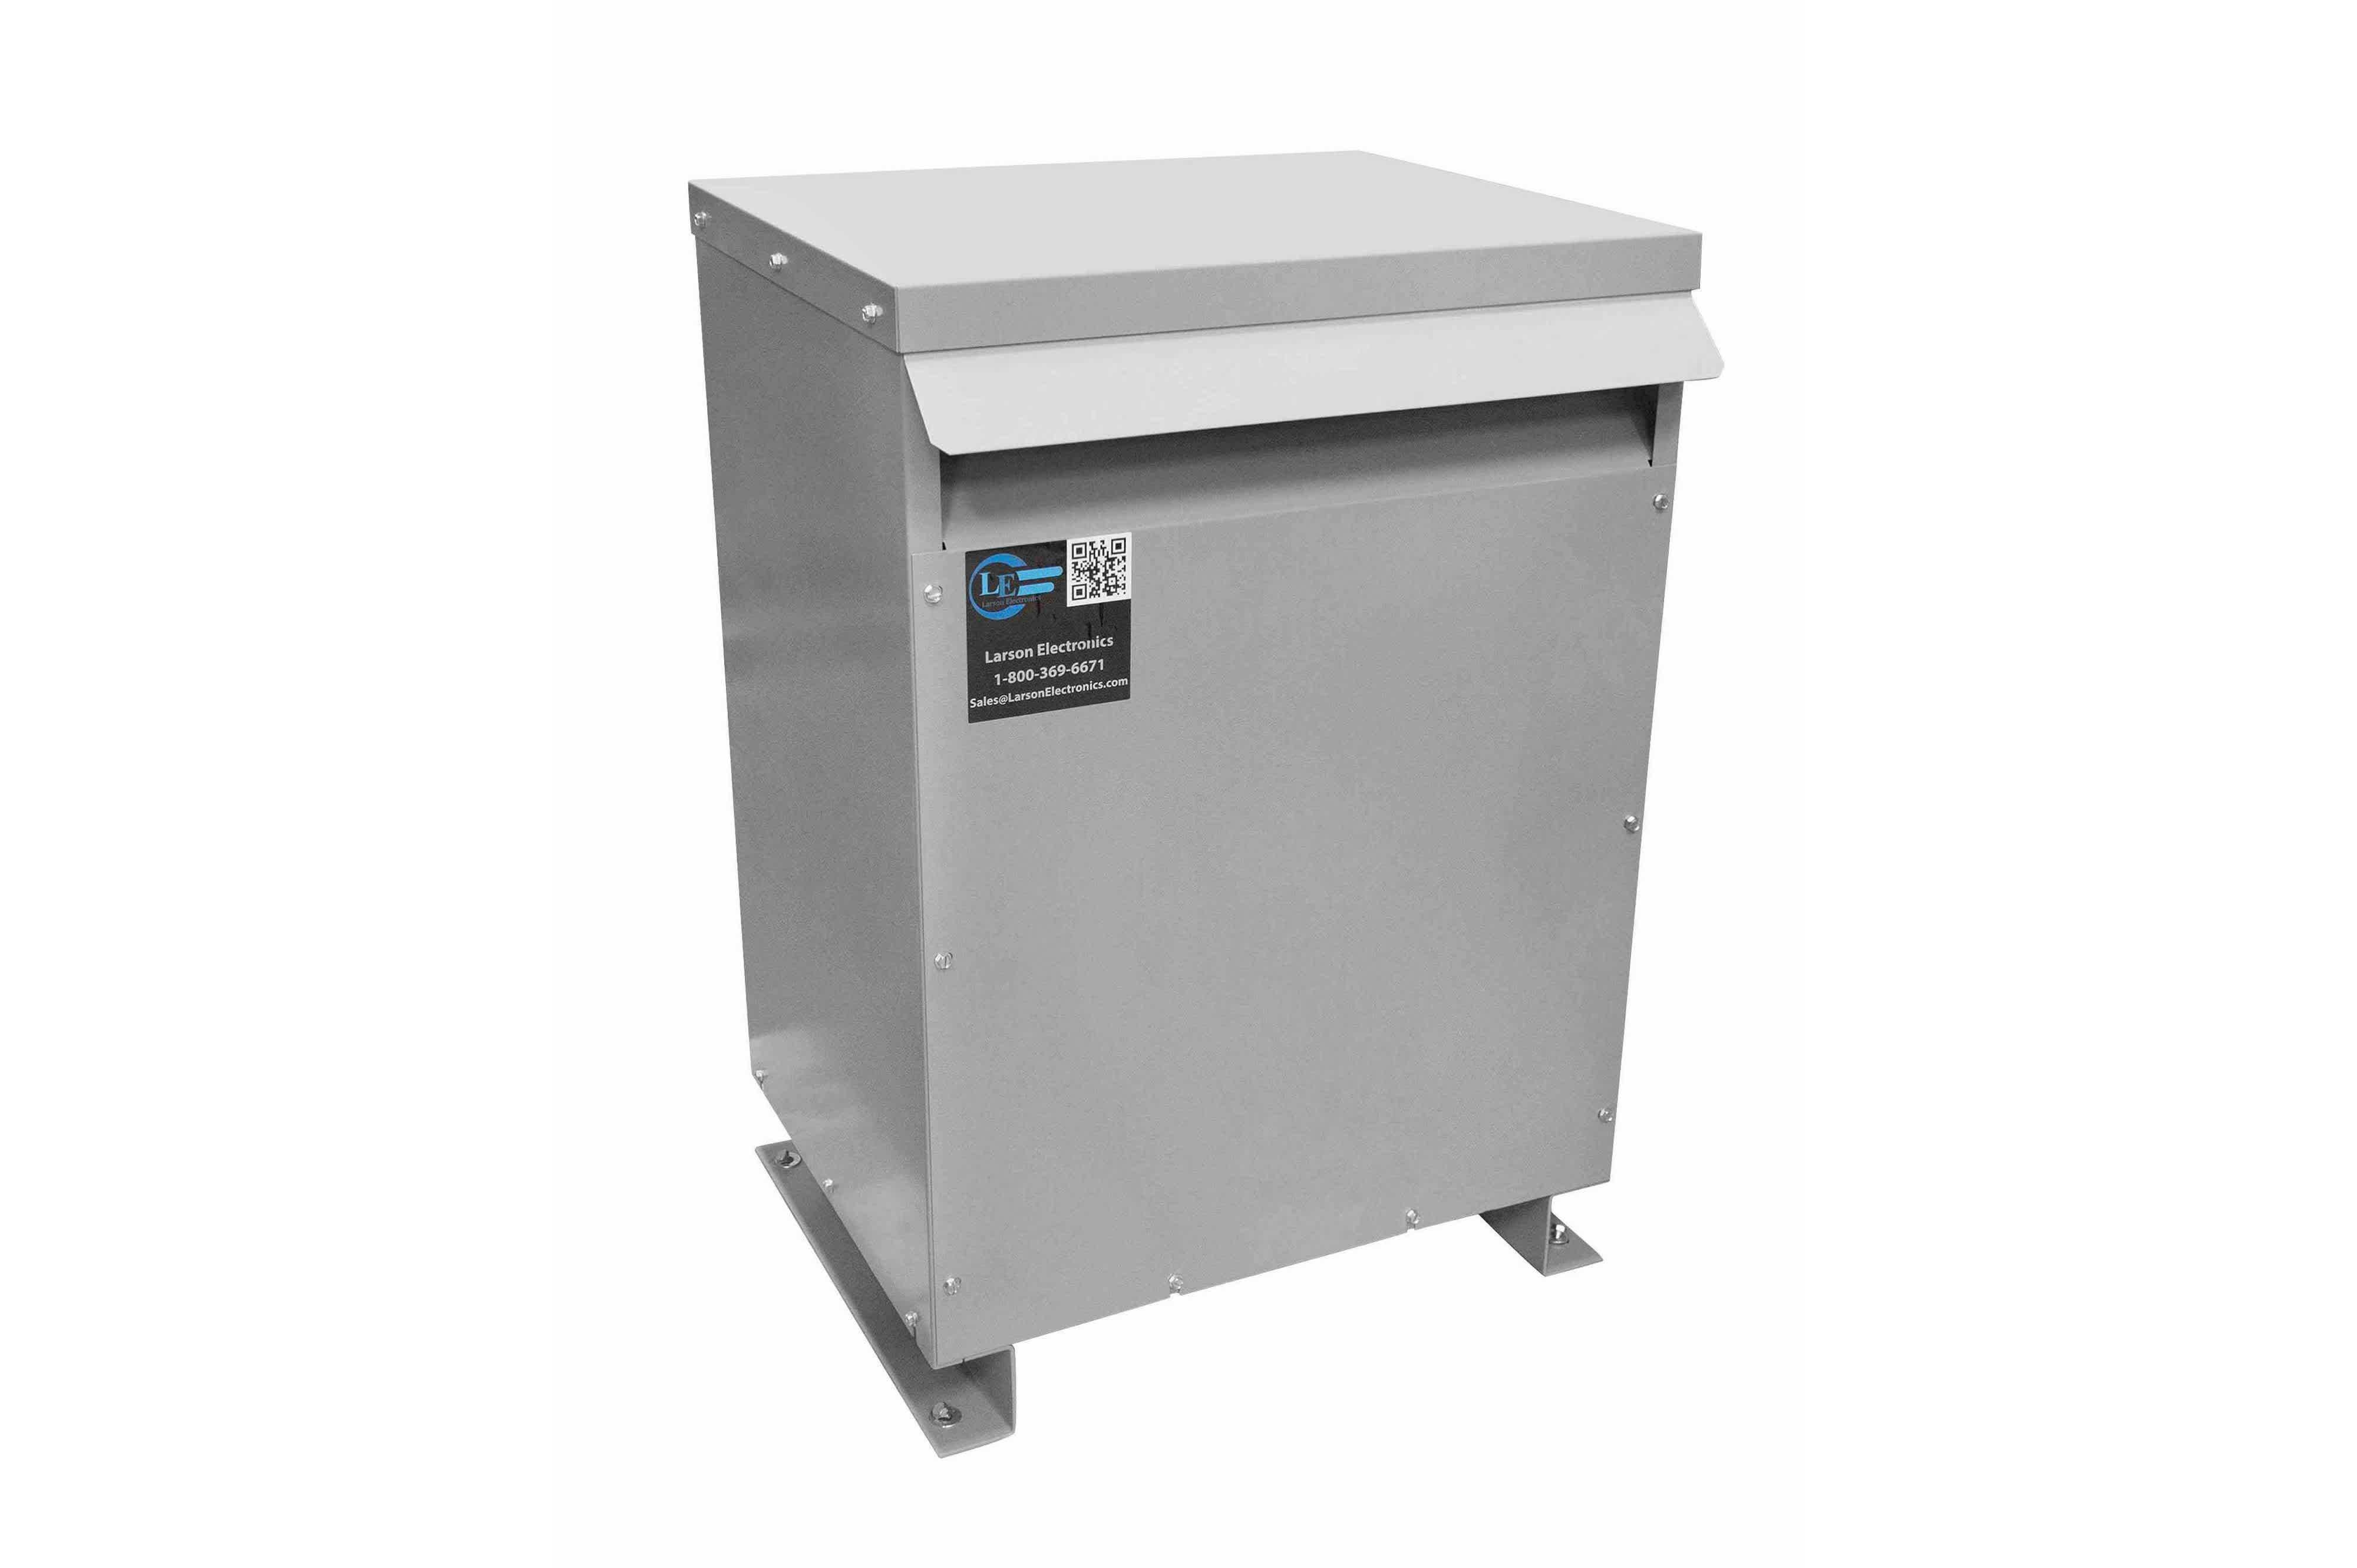 75 kVA 3PH DOE Transformer, 208V Delta Primary, 415Y/240 Wye-N Secondary, N3R, Ventilated, 60 Hz